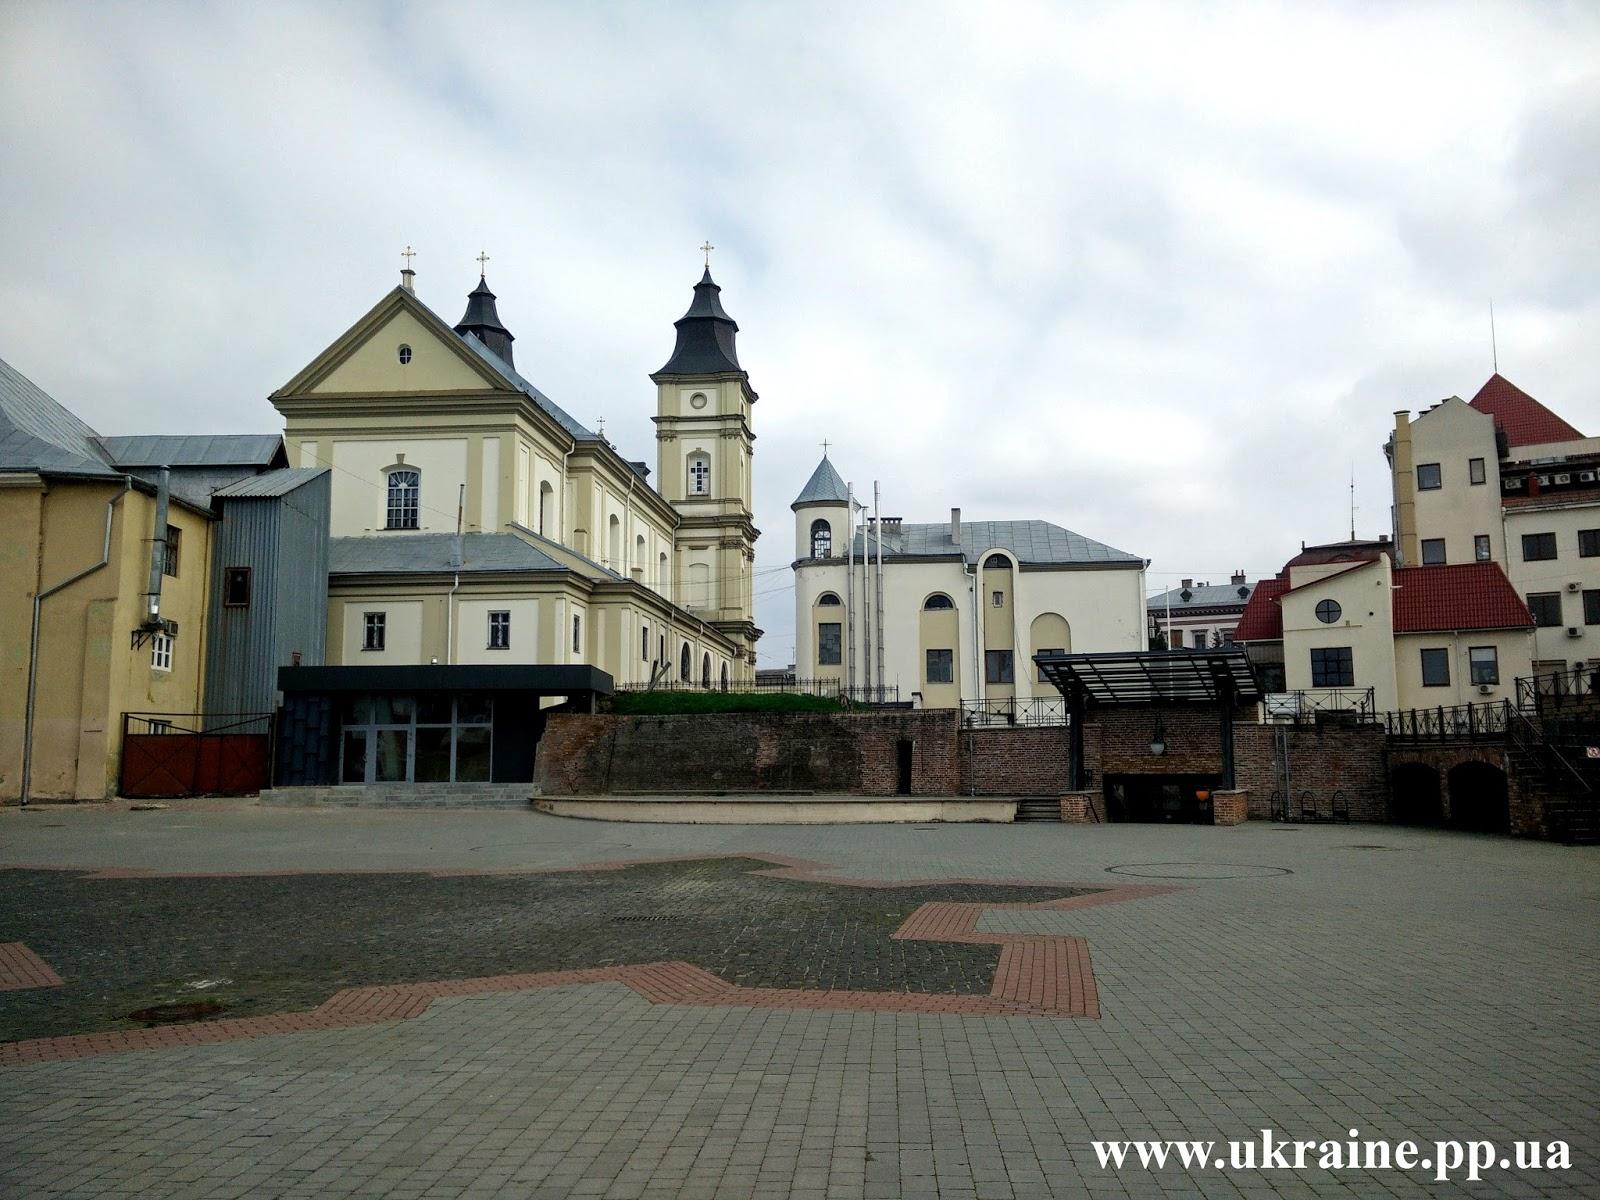 Город Ивано-Франковск Украина